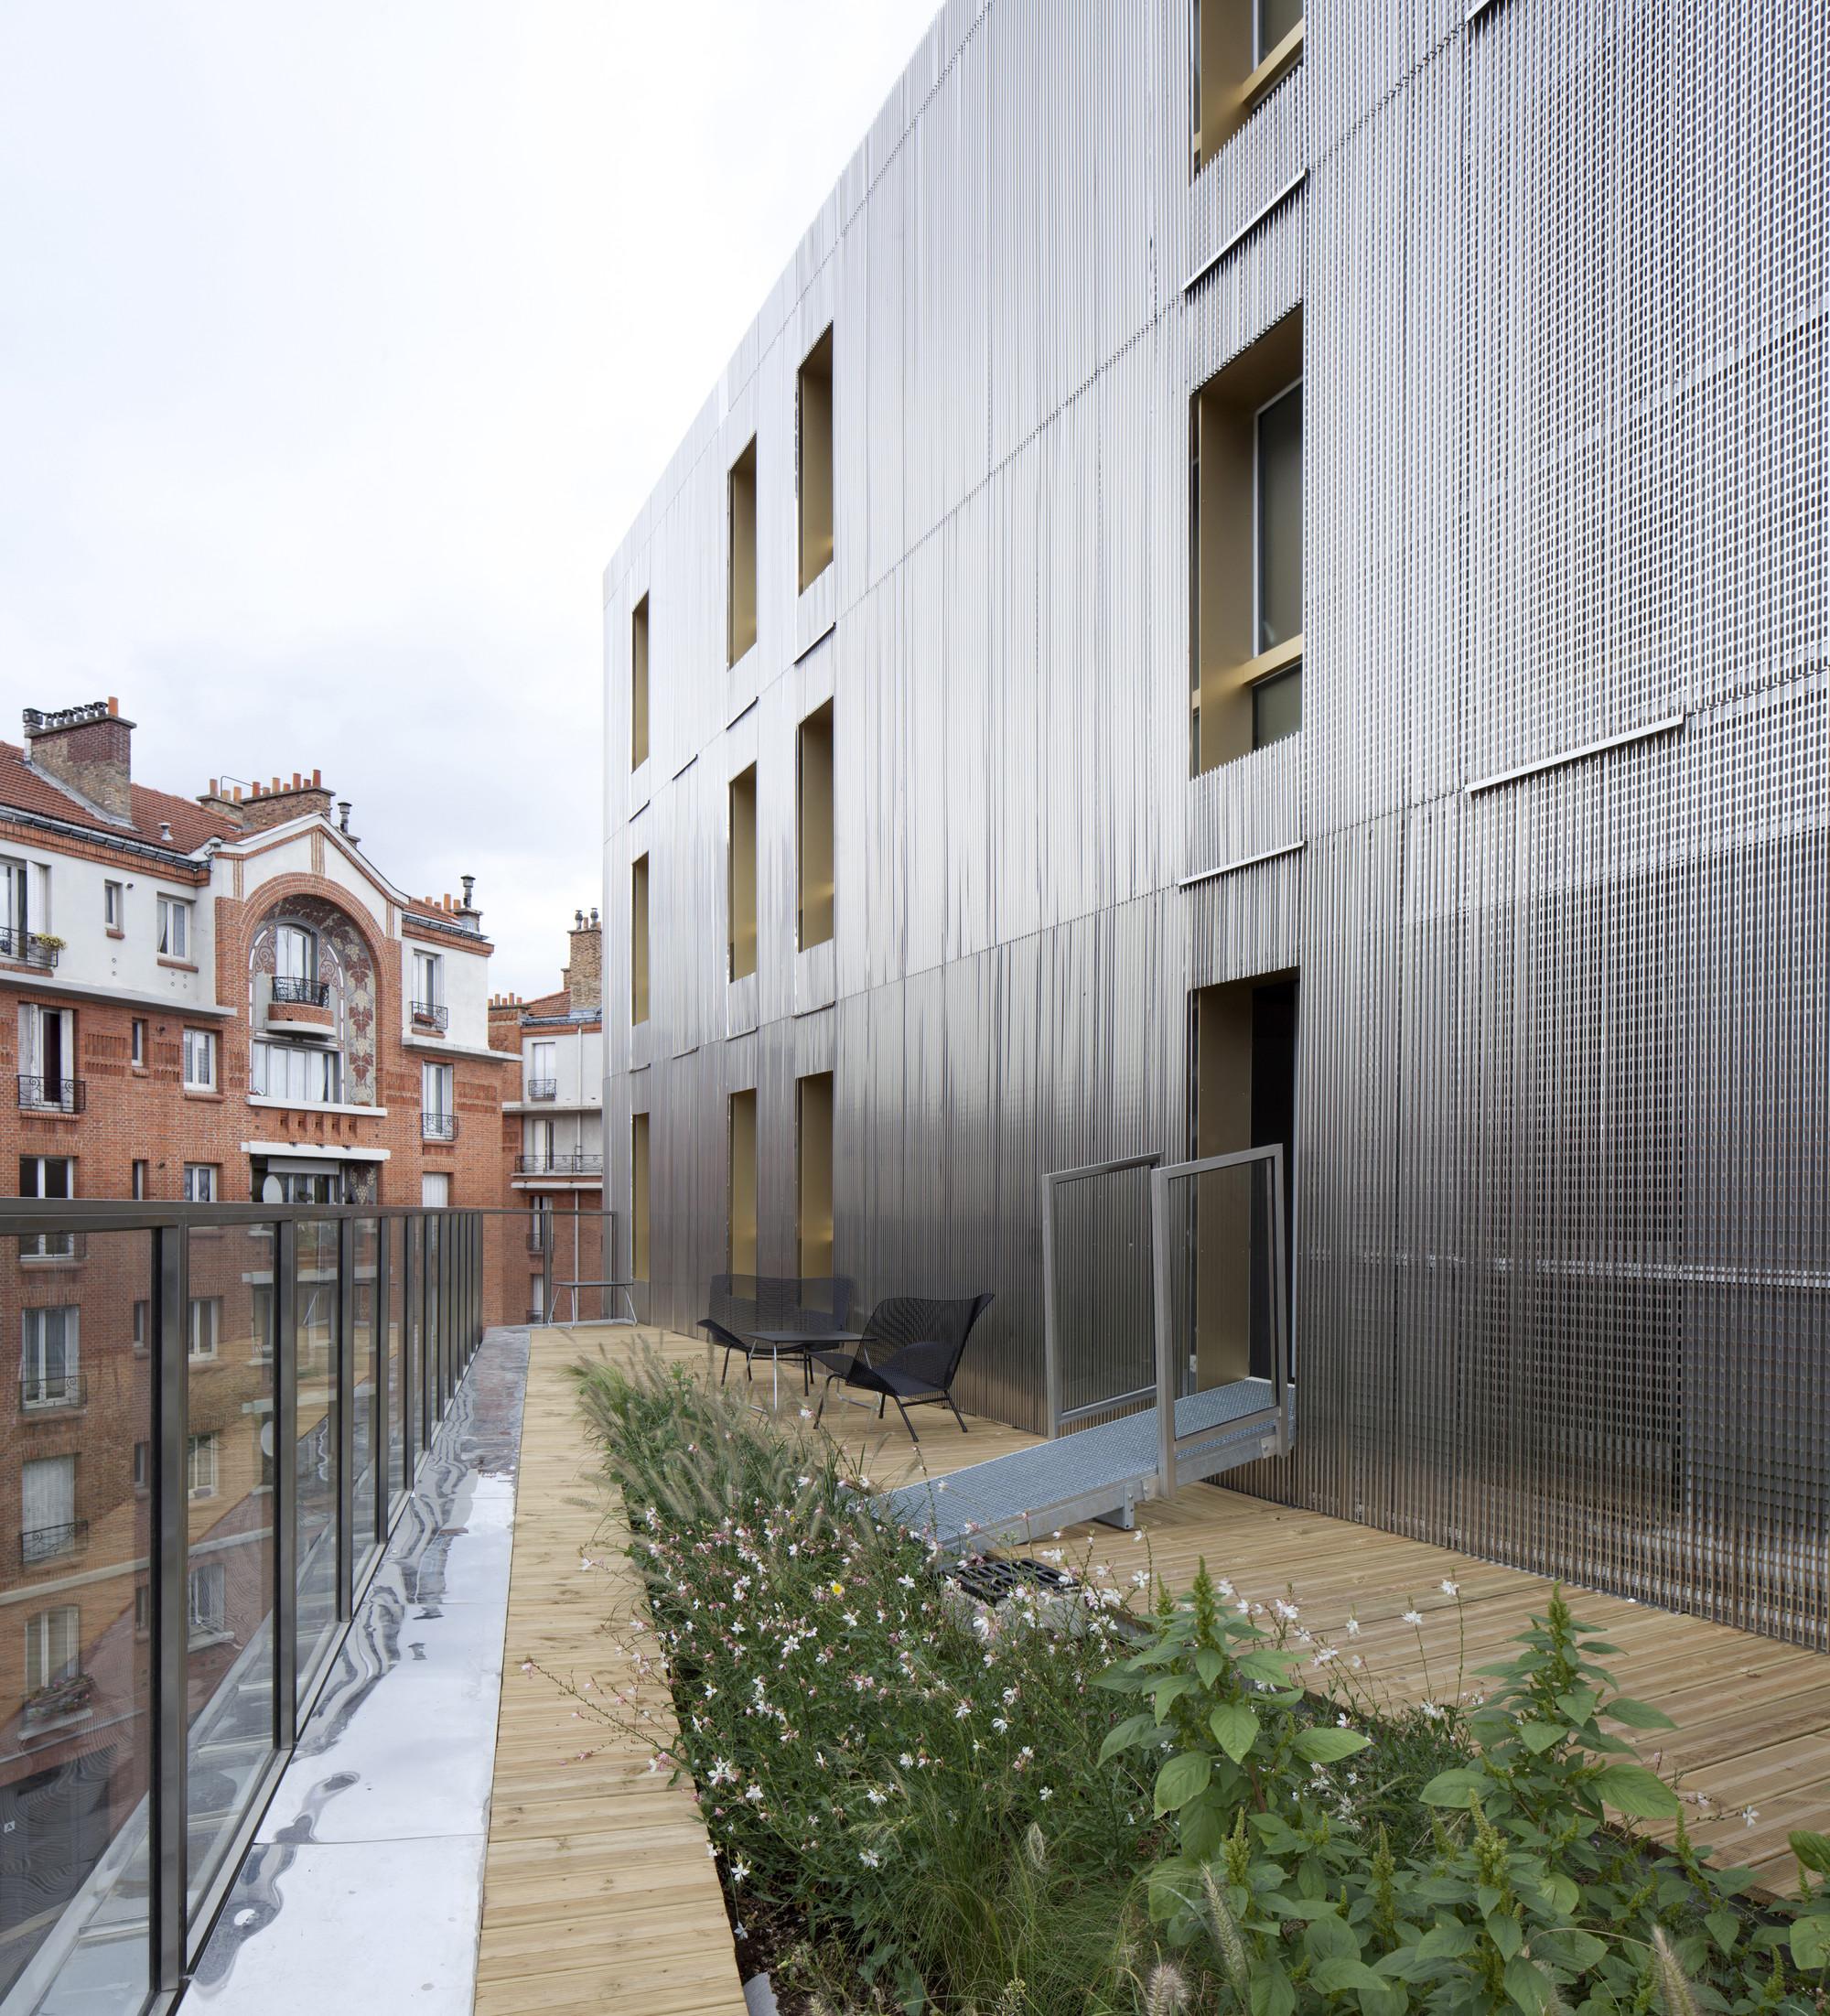 Irene Joliot Curie Residences / DATA [Architectes]